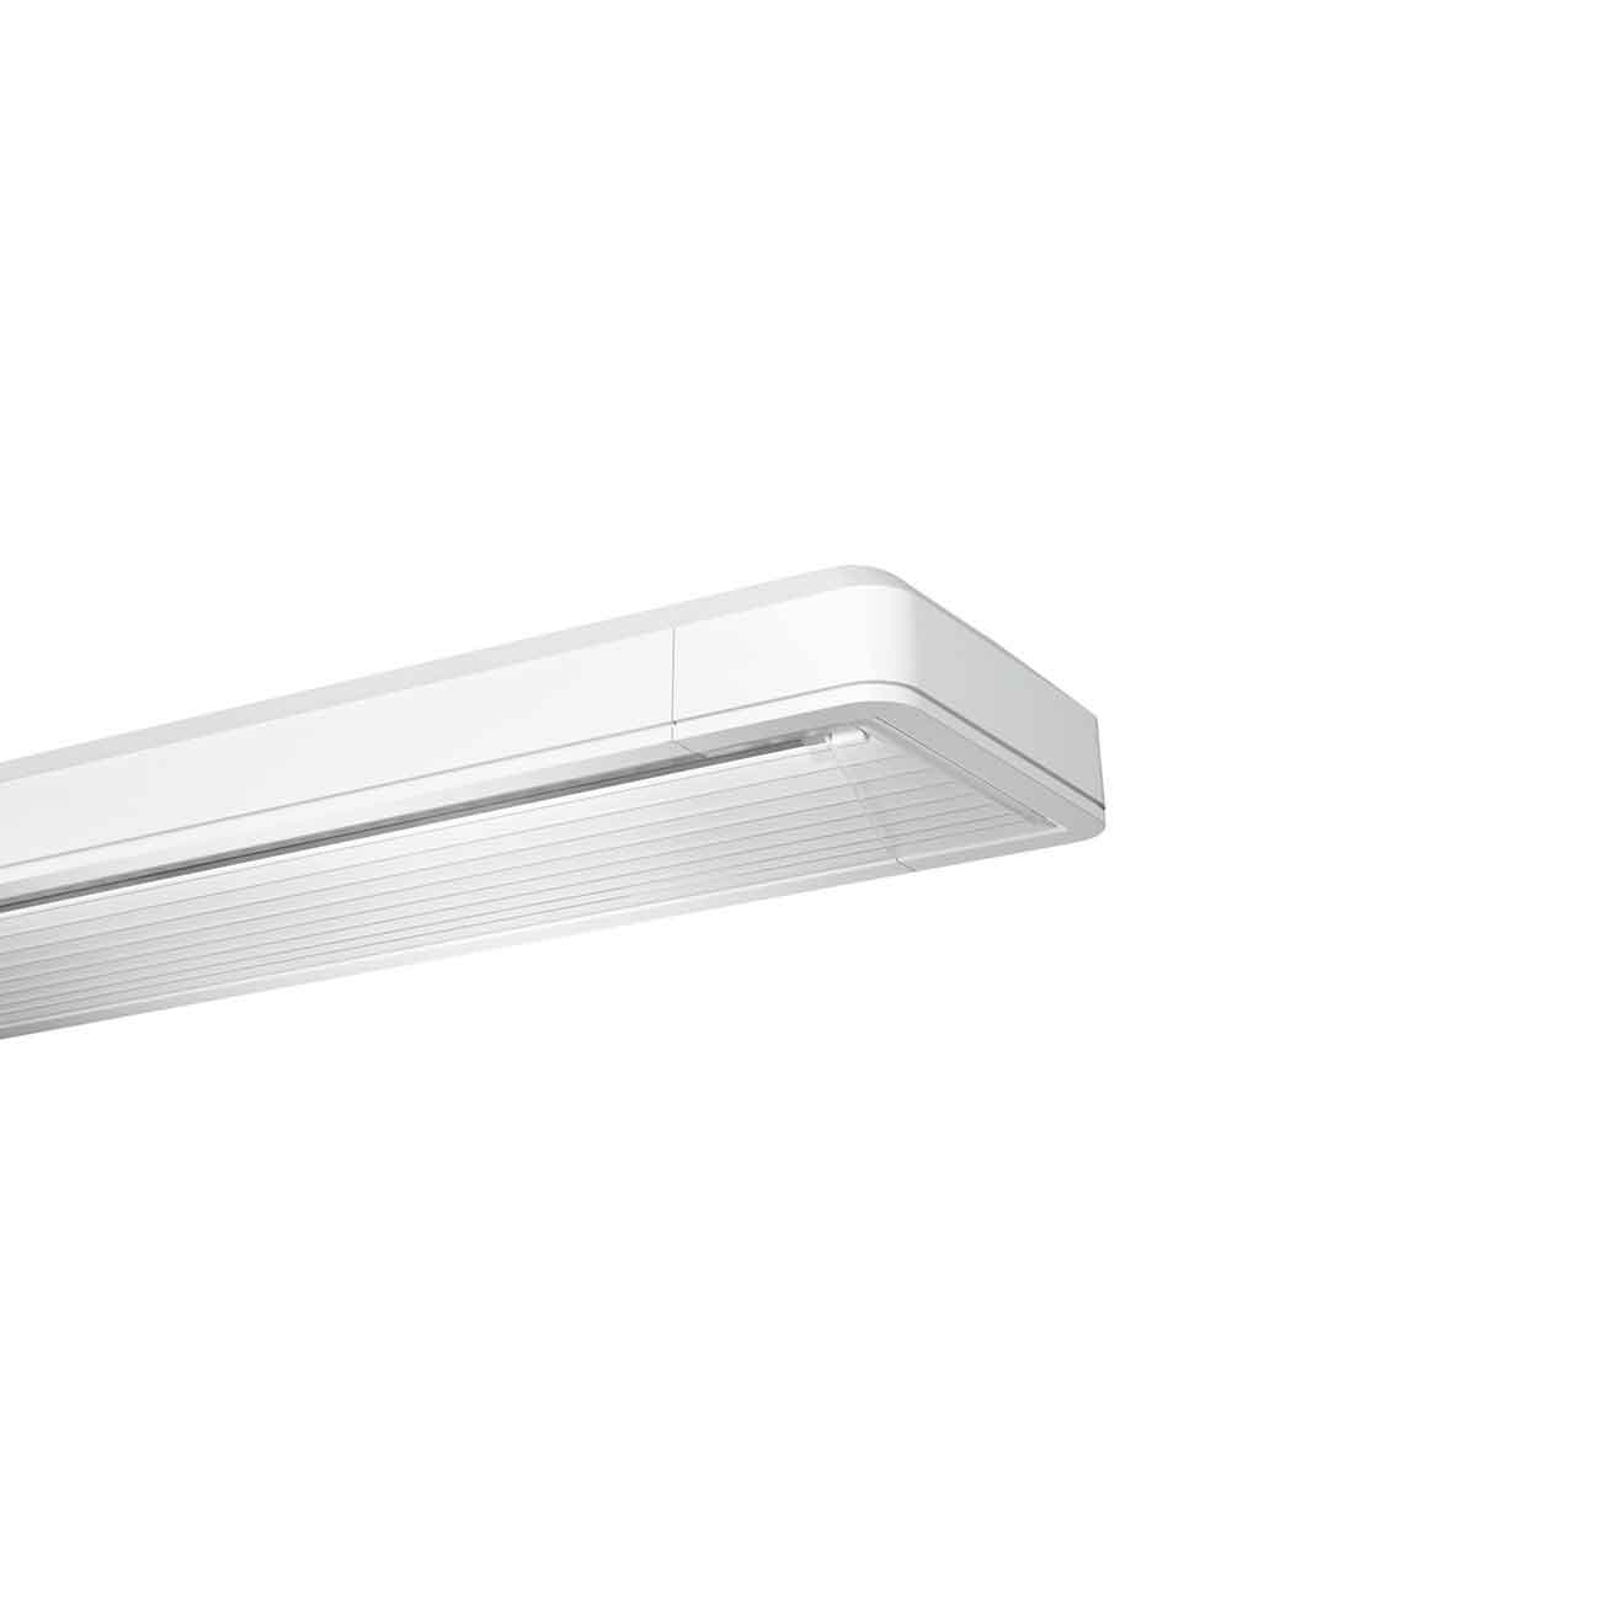 Siteco Taris plafonnier LED 123cm BE